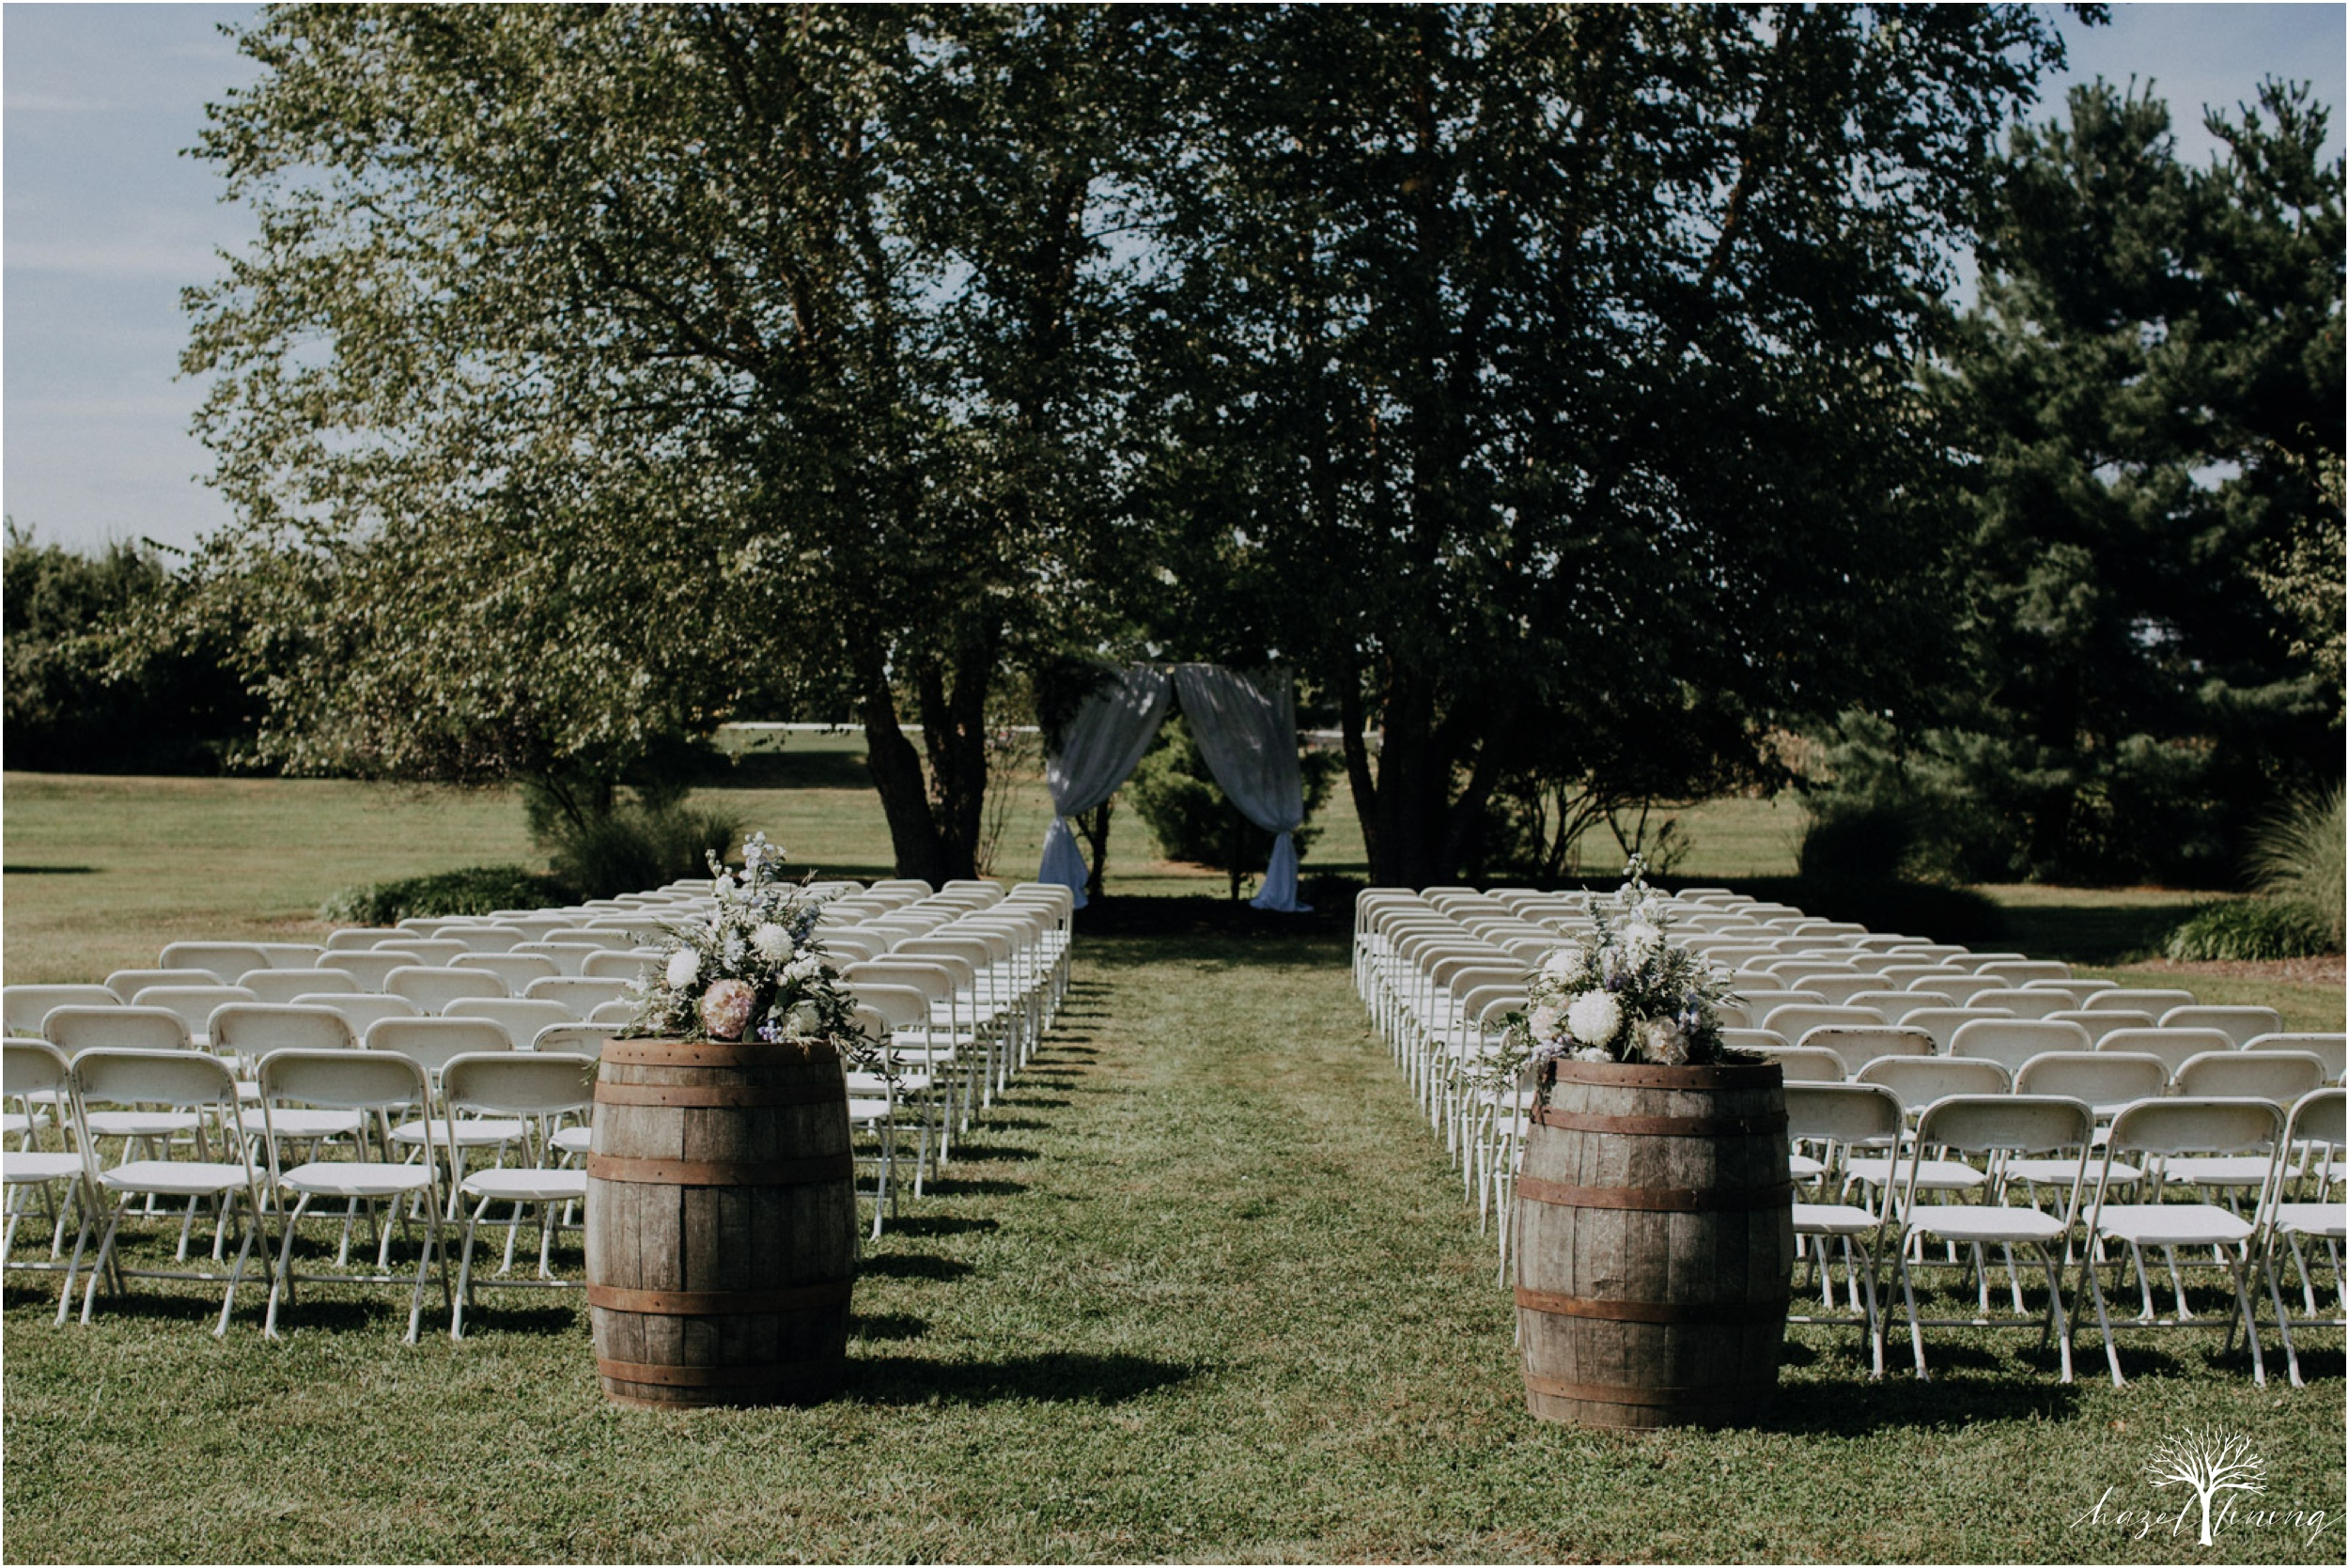 maureen-hepner-anthony-giordano-rose-bank-winery-newtow-pennsylvania-luxury-summer-wedding-hazel-lining-photography-destination-elopement-wedding-engagement-photography_0058.jpg